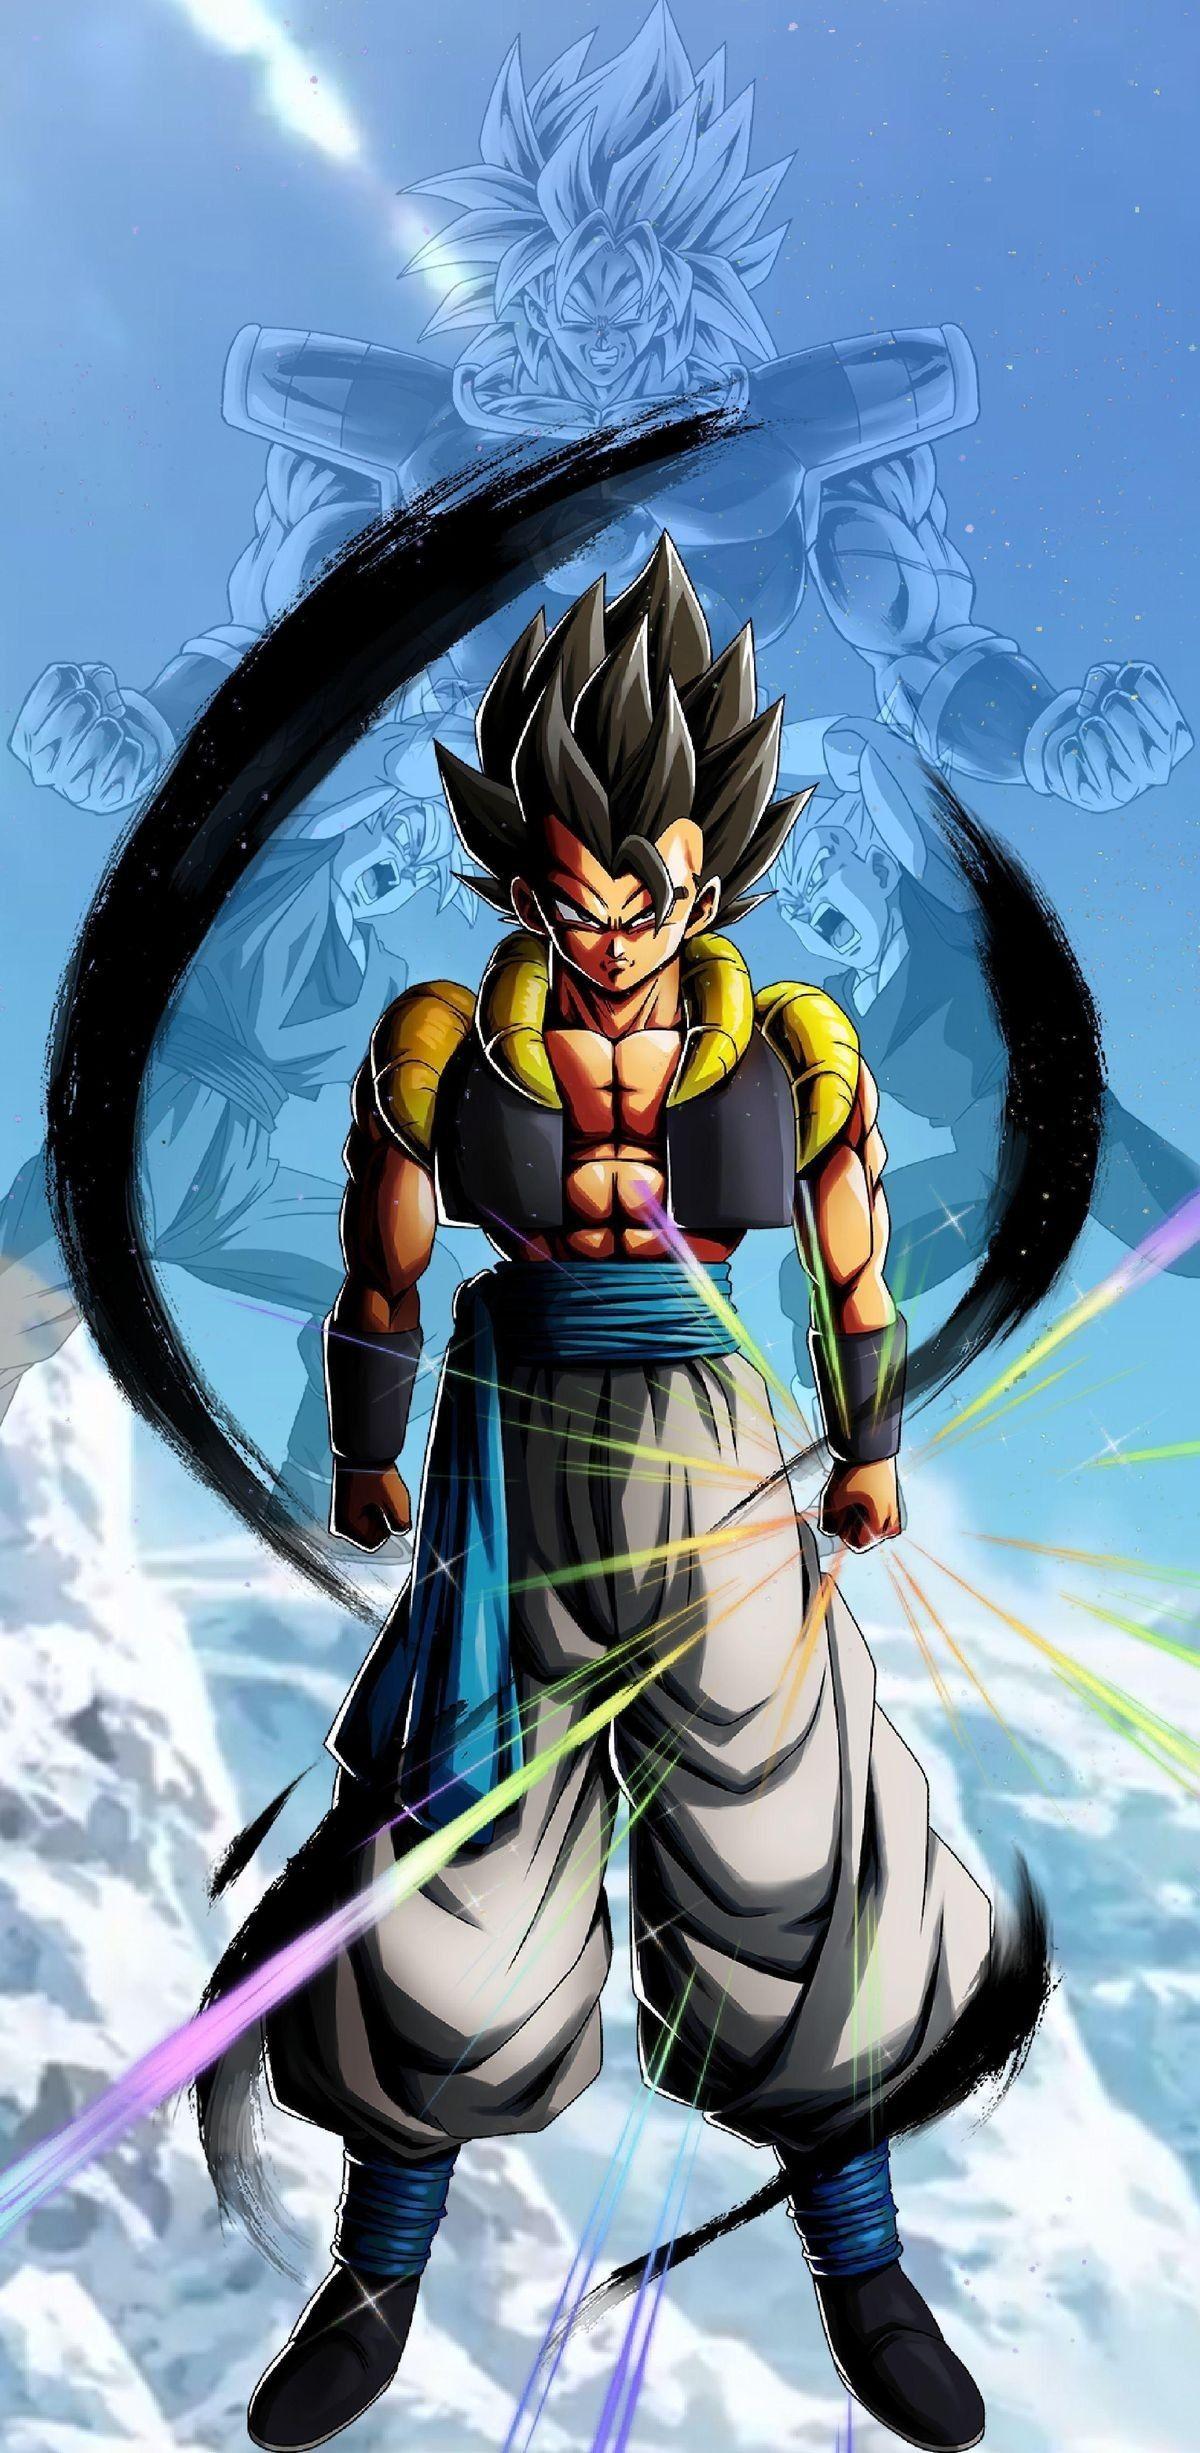 Pin By Saints On Anime Dragon Ball Wallpapers Anime Dragon Ball Super Dragon Ball Goku